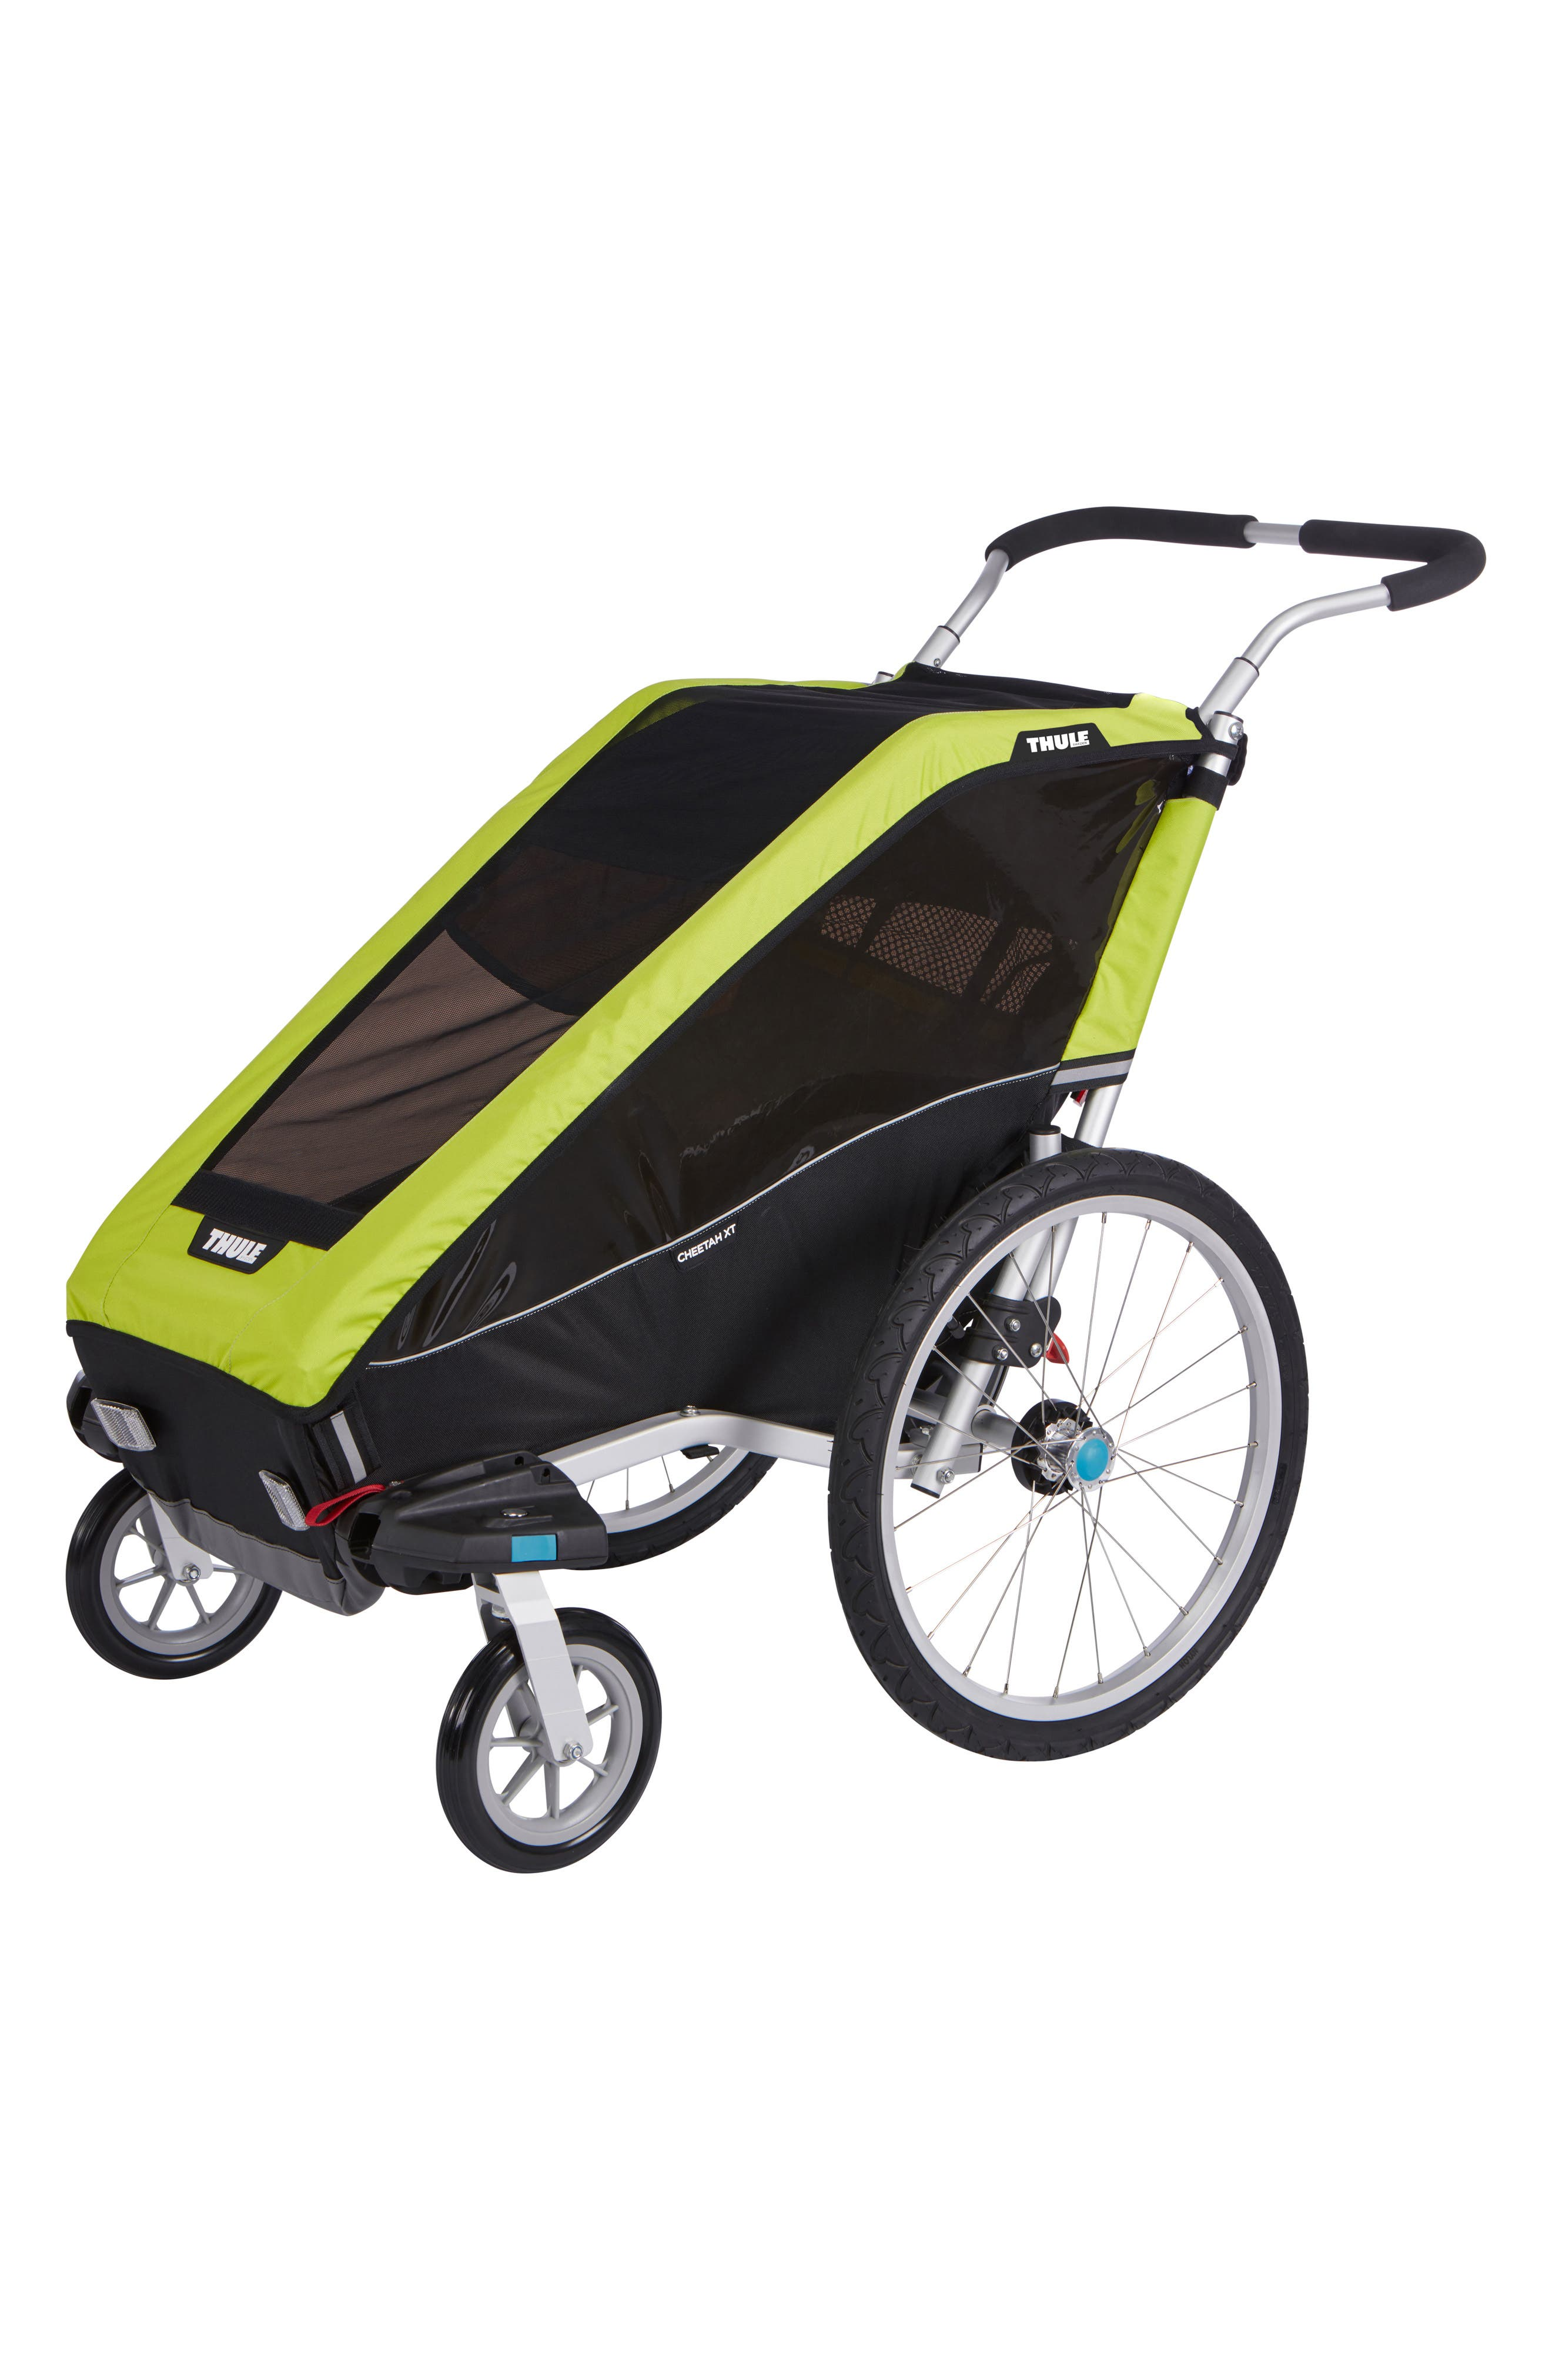 Thule Chariot Cheetah XT 2 Multisport Cycle Trailer/Stroller